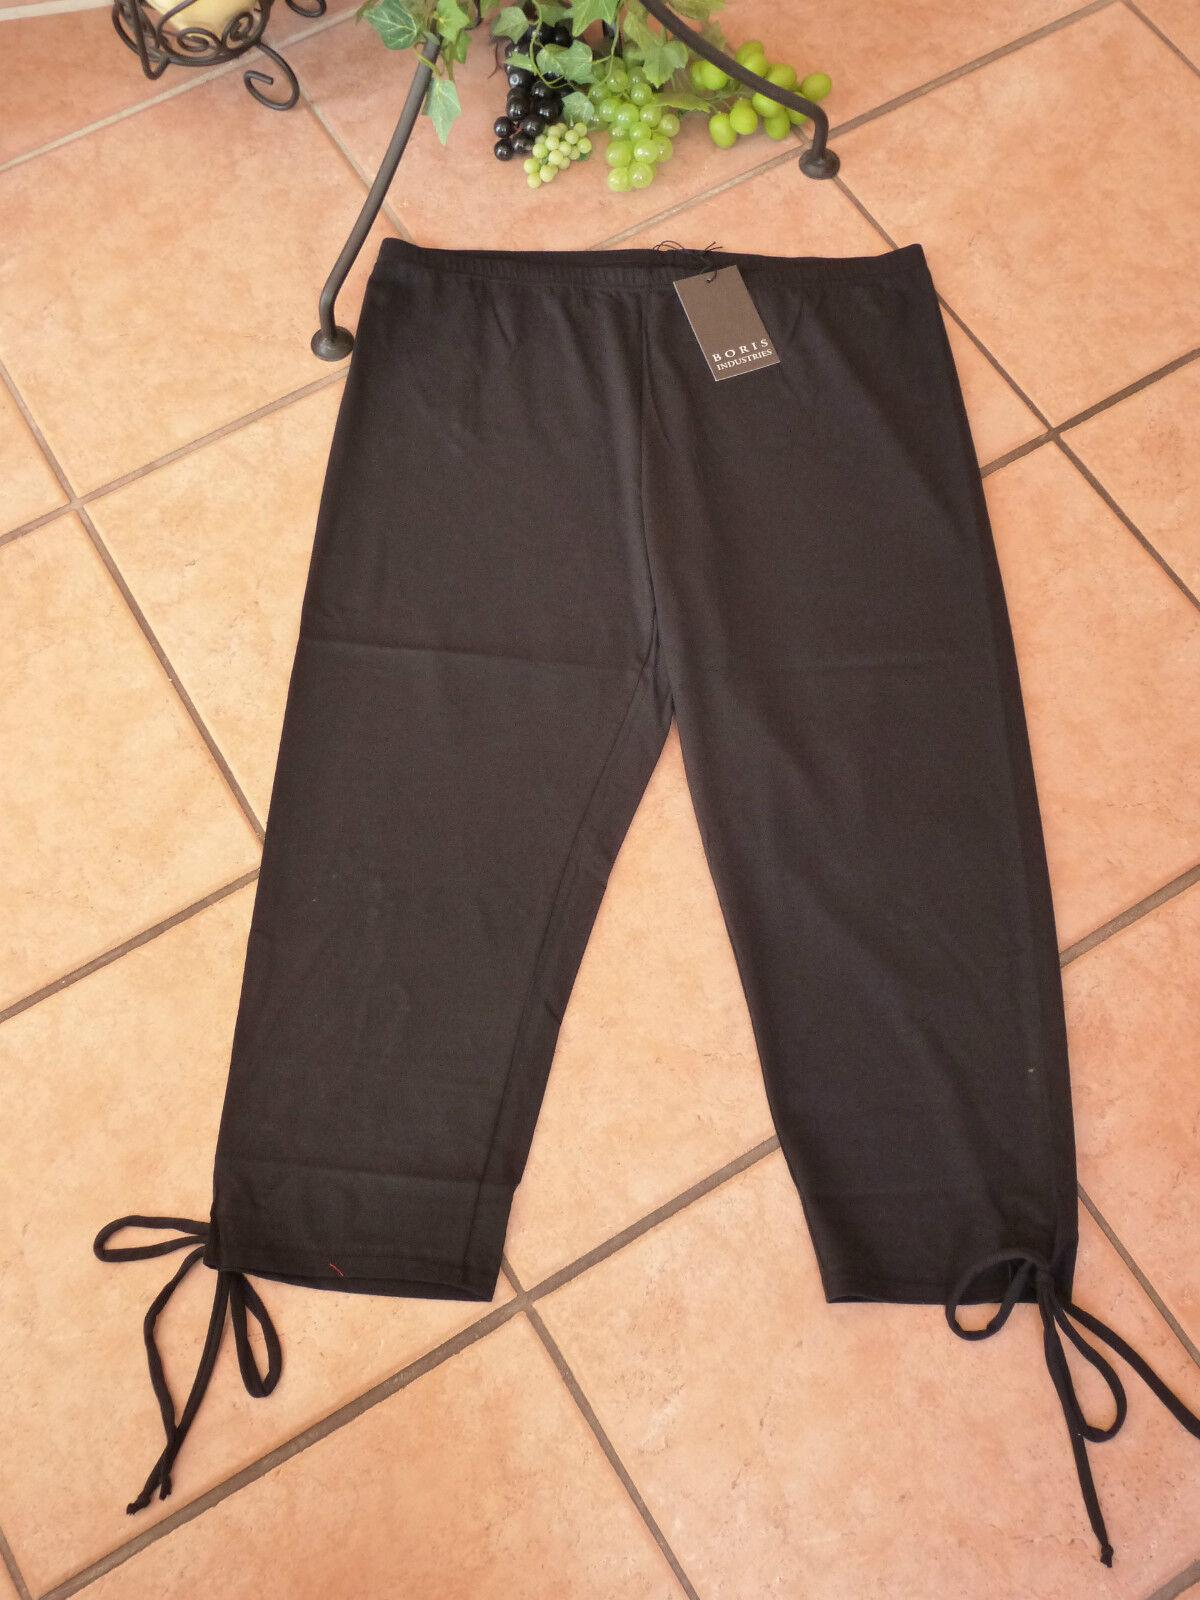 BORIS INDUSTRIES 7 8 Leggings 50 52 54 (5) NEU black Bänder LAGENLOOK Stretch